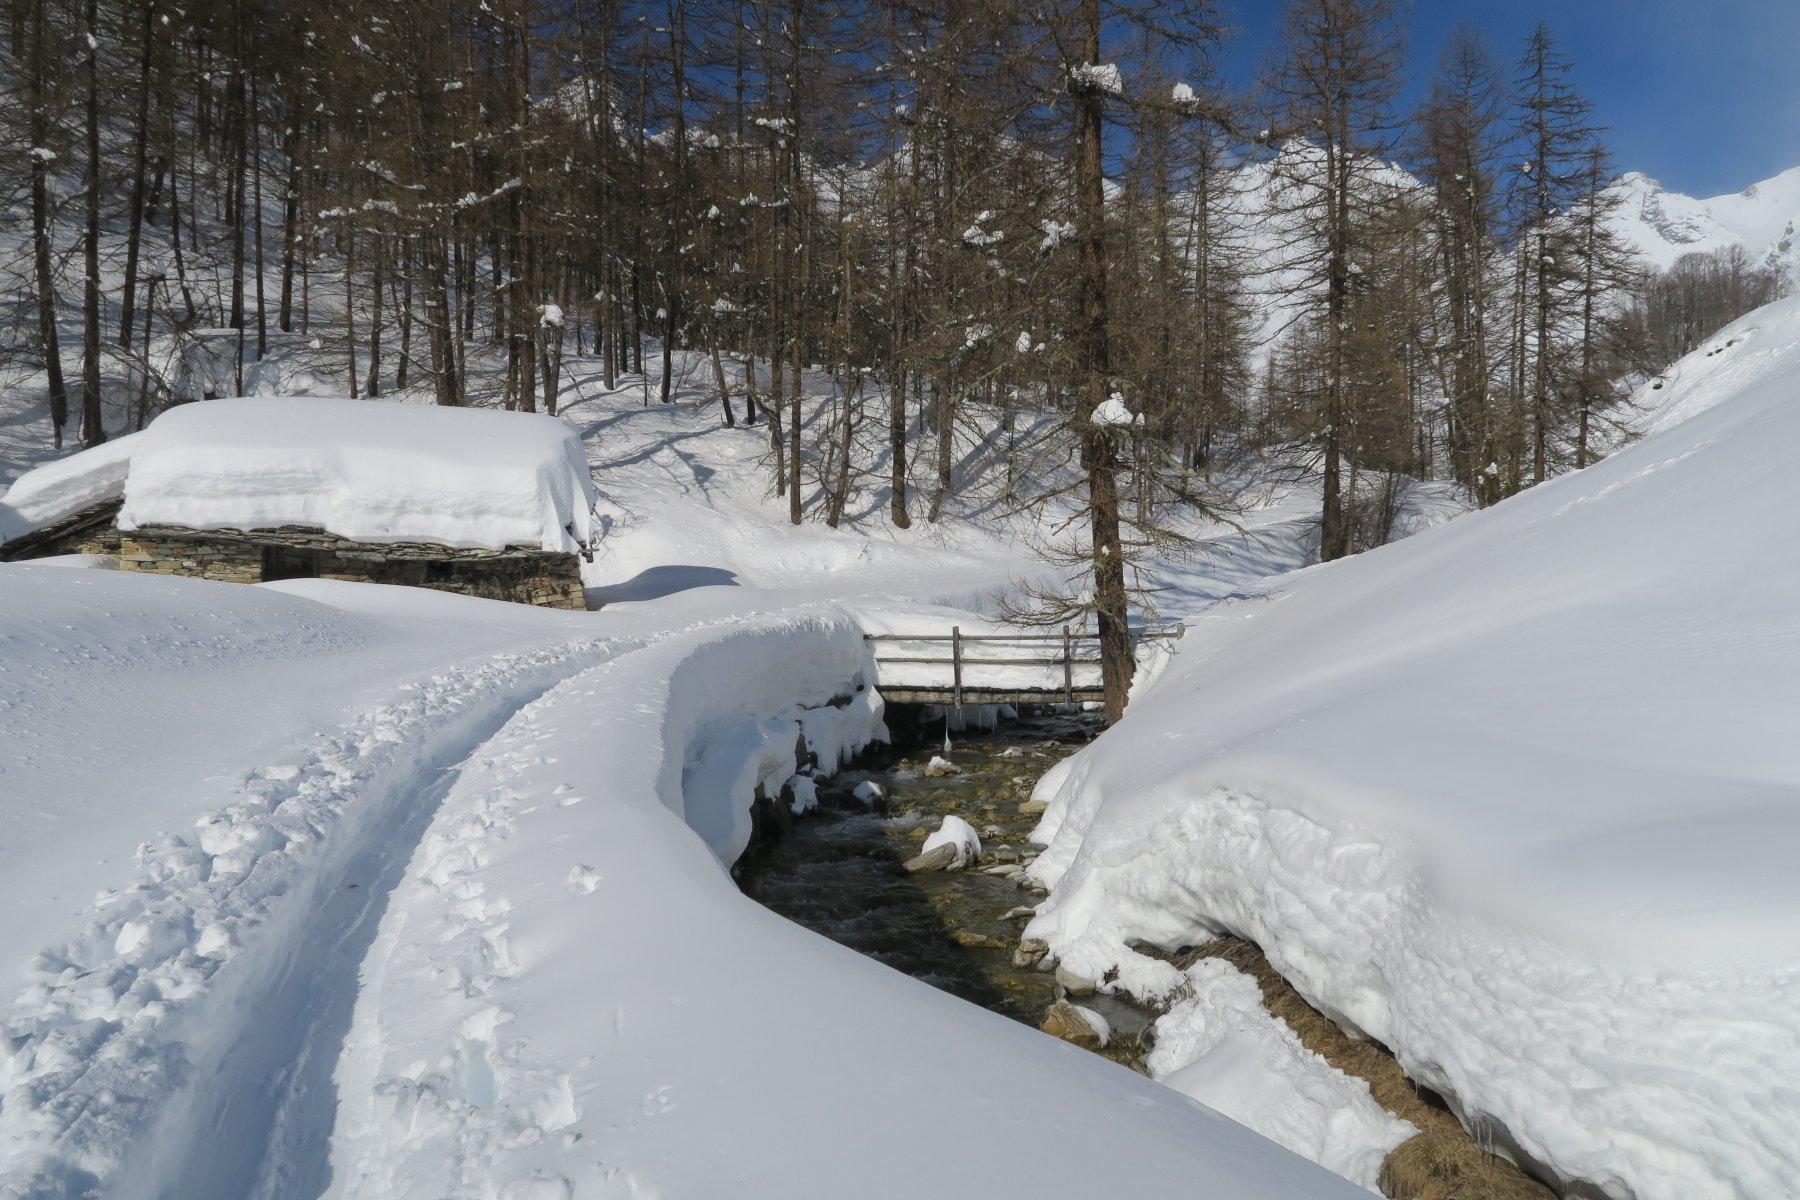 tanta neve anche in basso